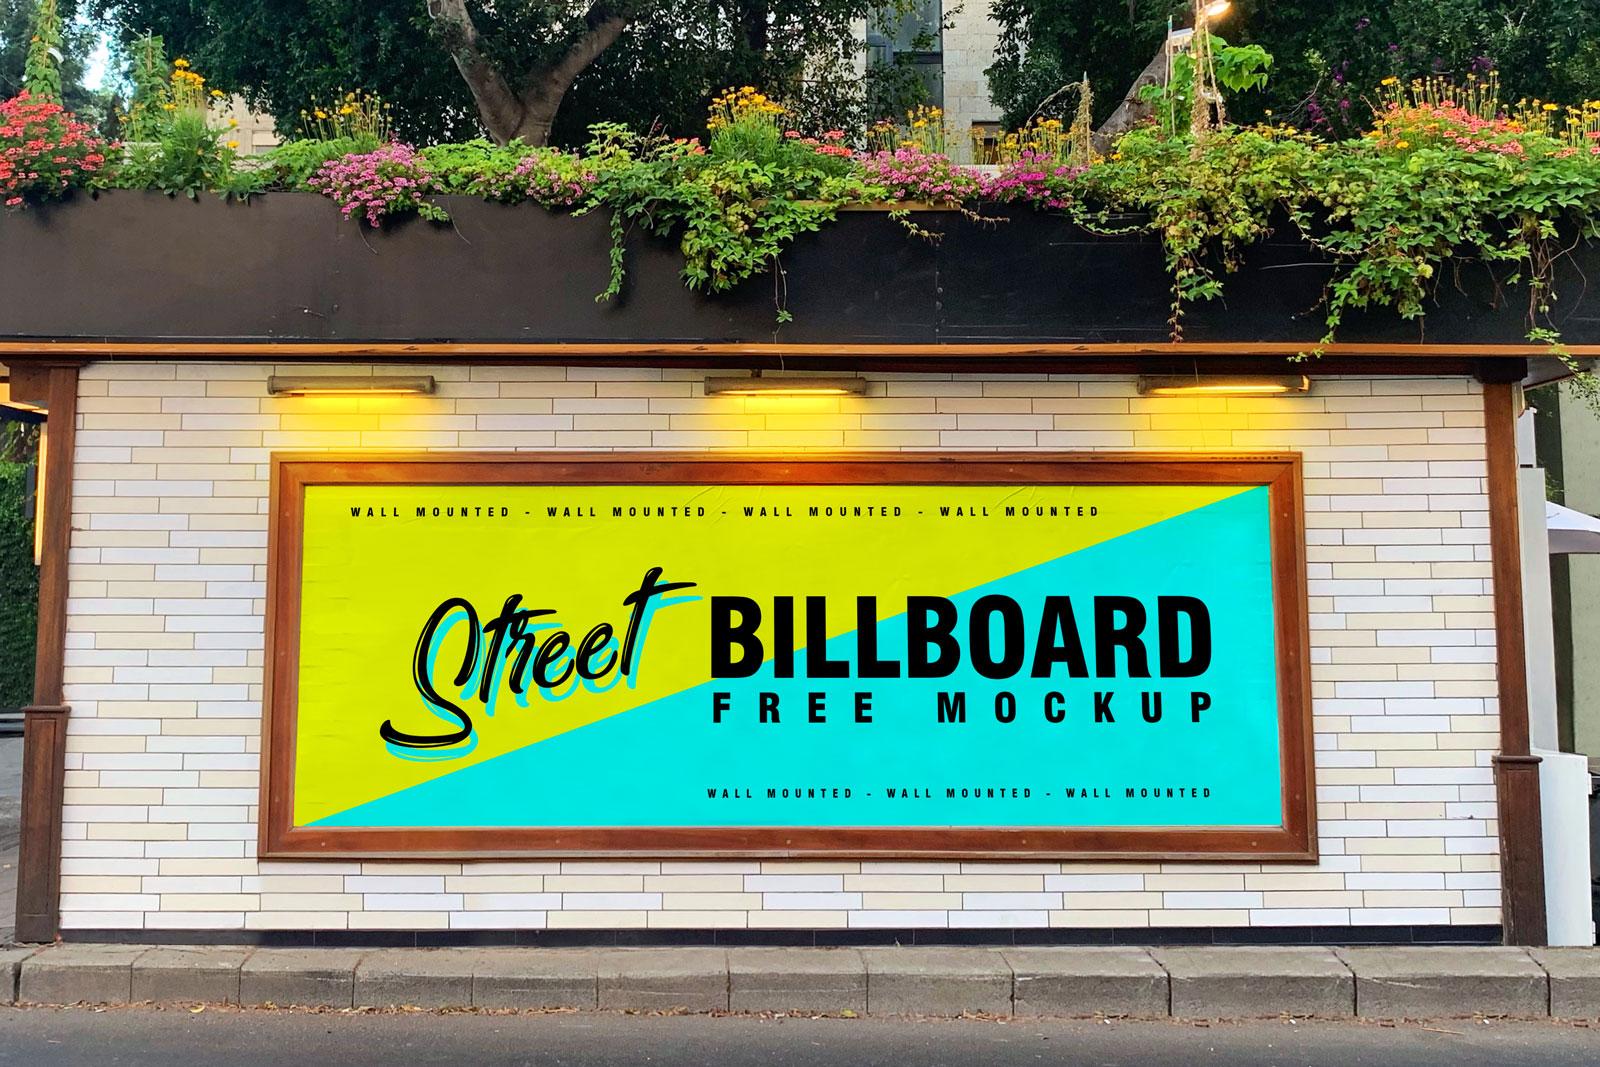 Free Street Wall Mounted Billboard Mockup